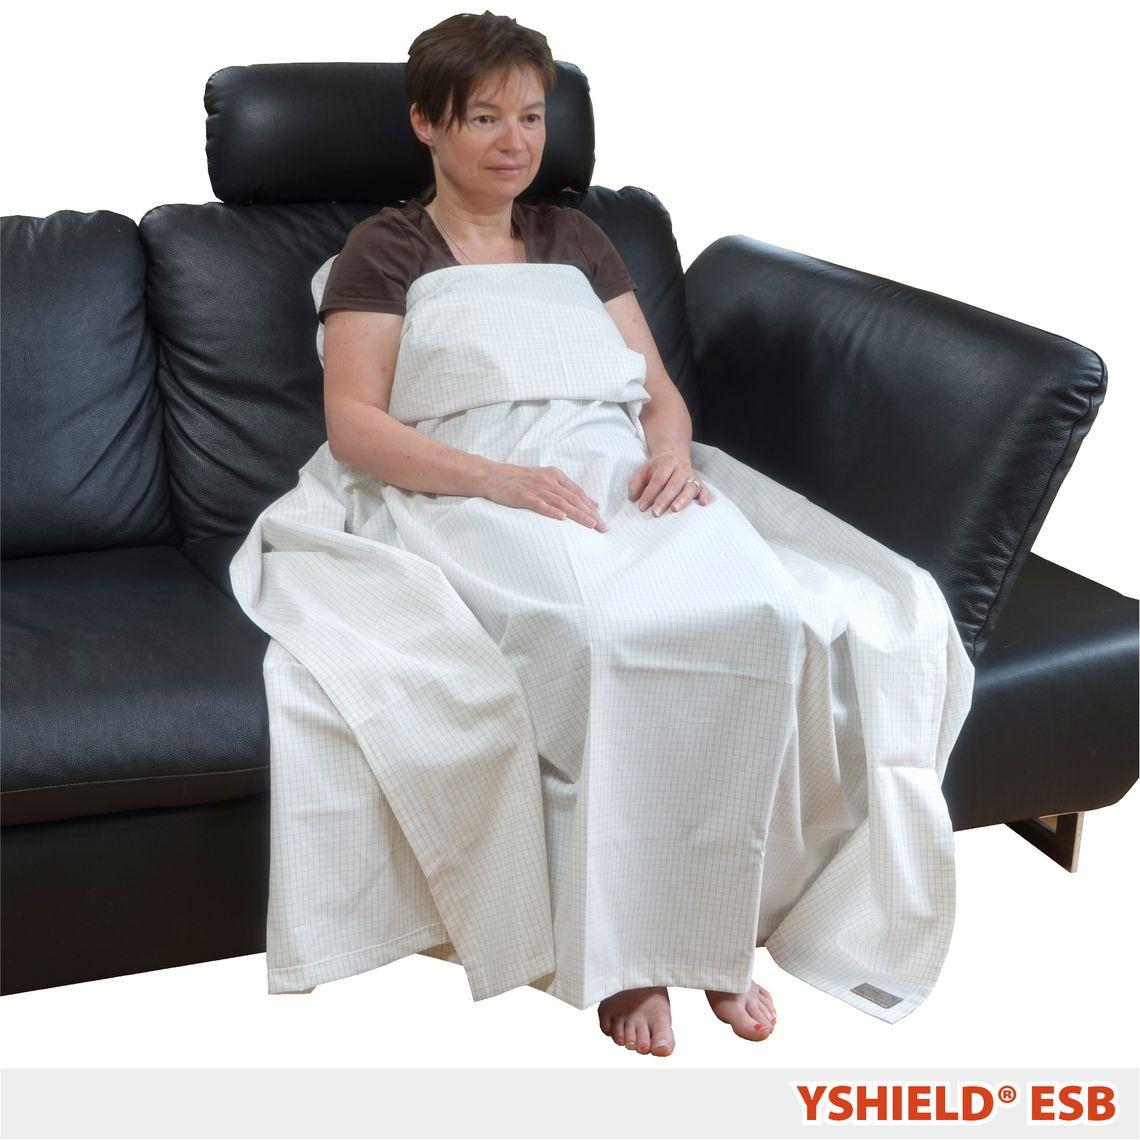 YSHIELD® ESB   Earthing   Blanket